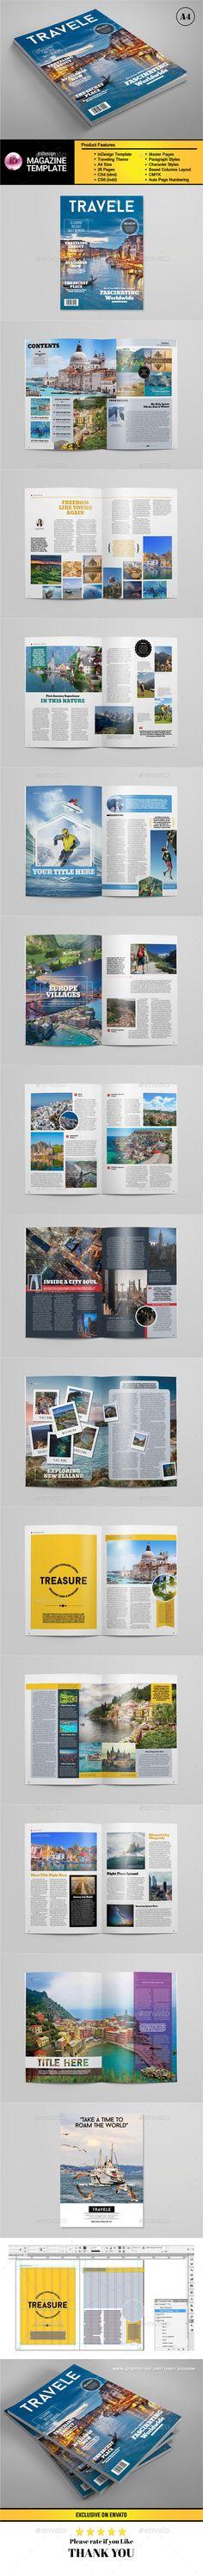 A4 Traveling Magazine Template #design Download: http://graphicriver.net/item/a4-traveling-magazine-template/13000919?ref=ksioks